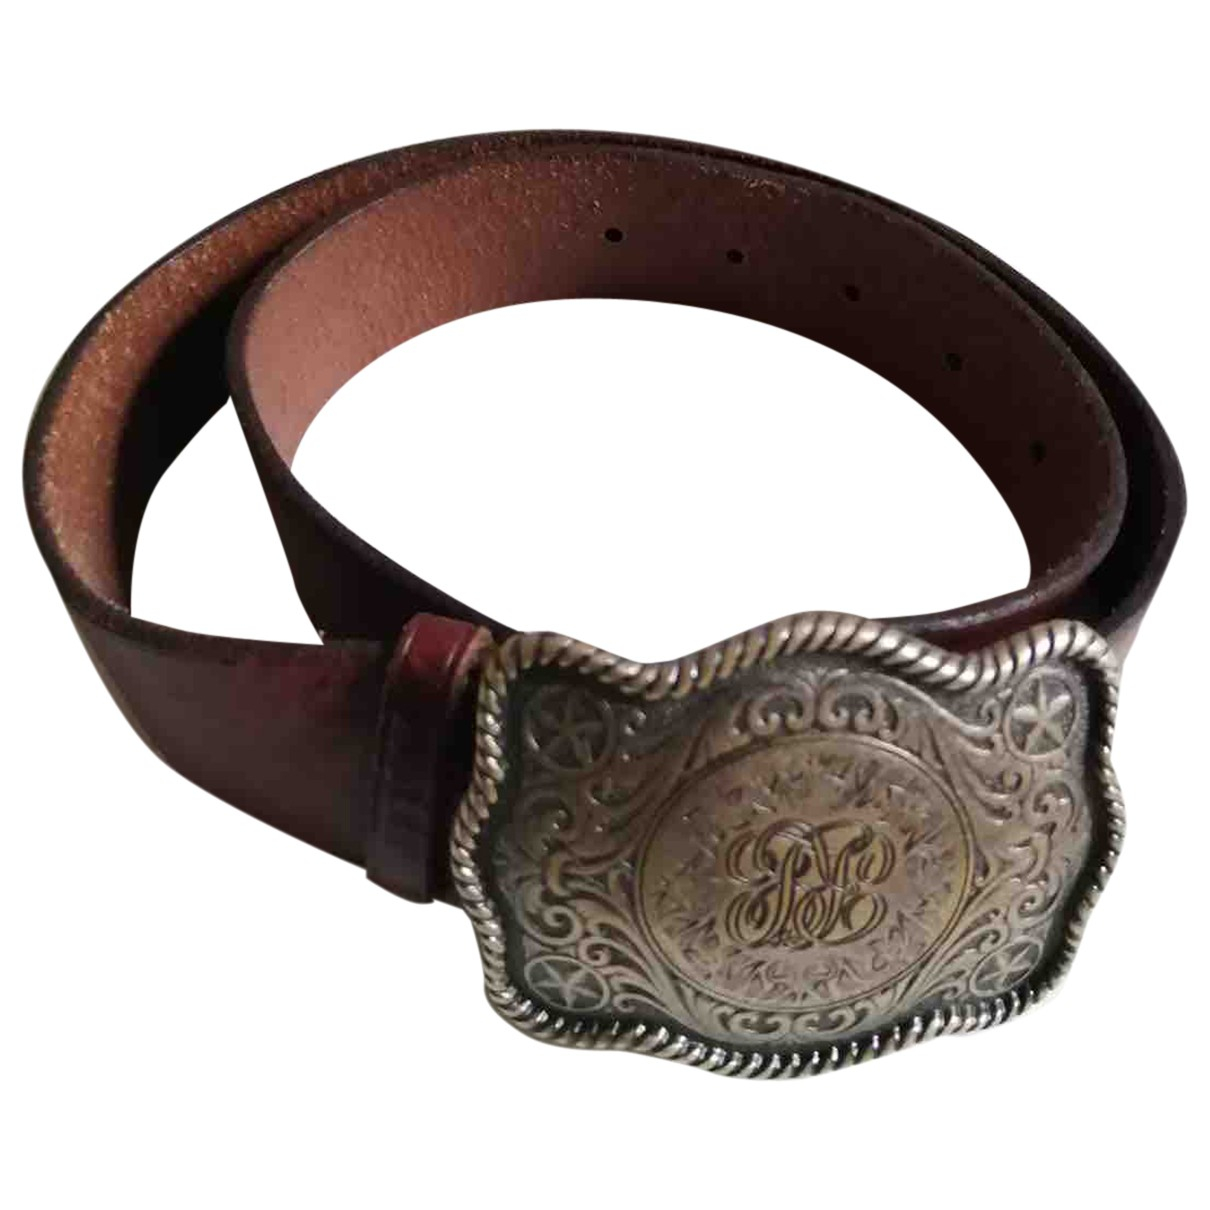 Ralph Lauren \N Multicolour Leather belt for Women 31 Inches